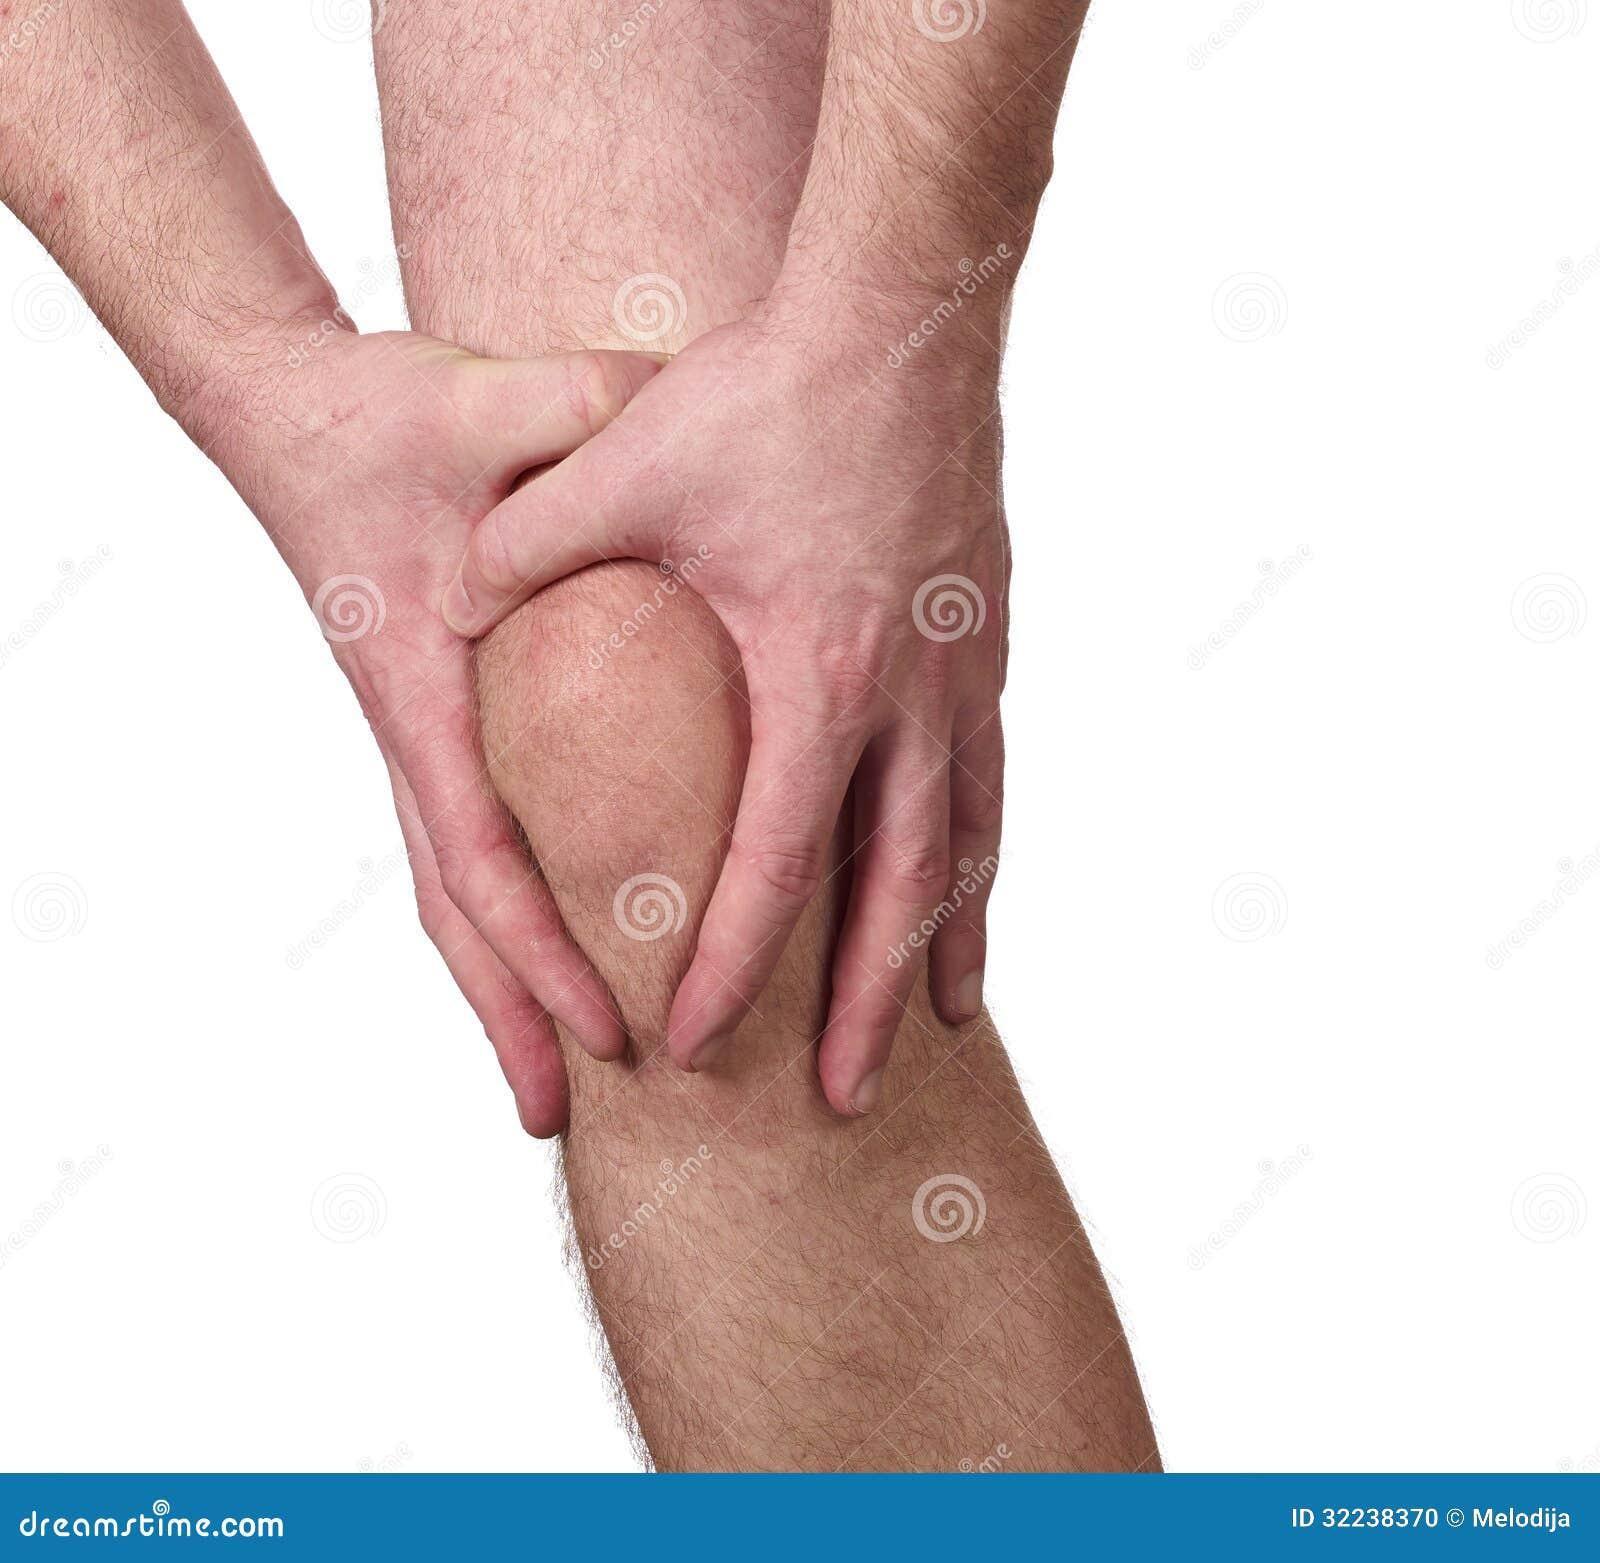 Hombres en fotos de sexo de dolor